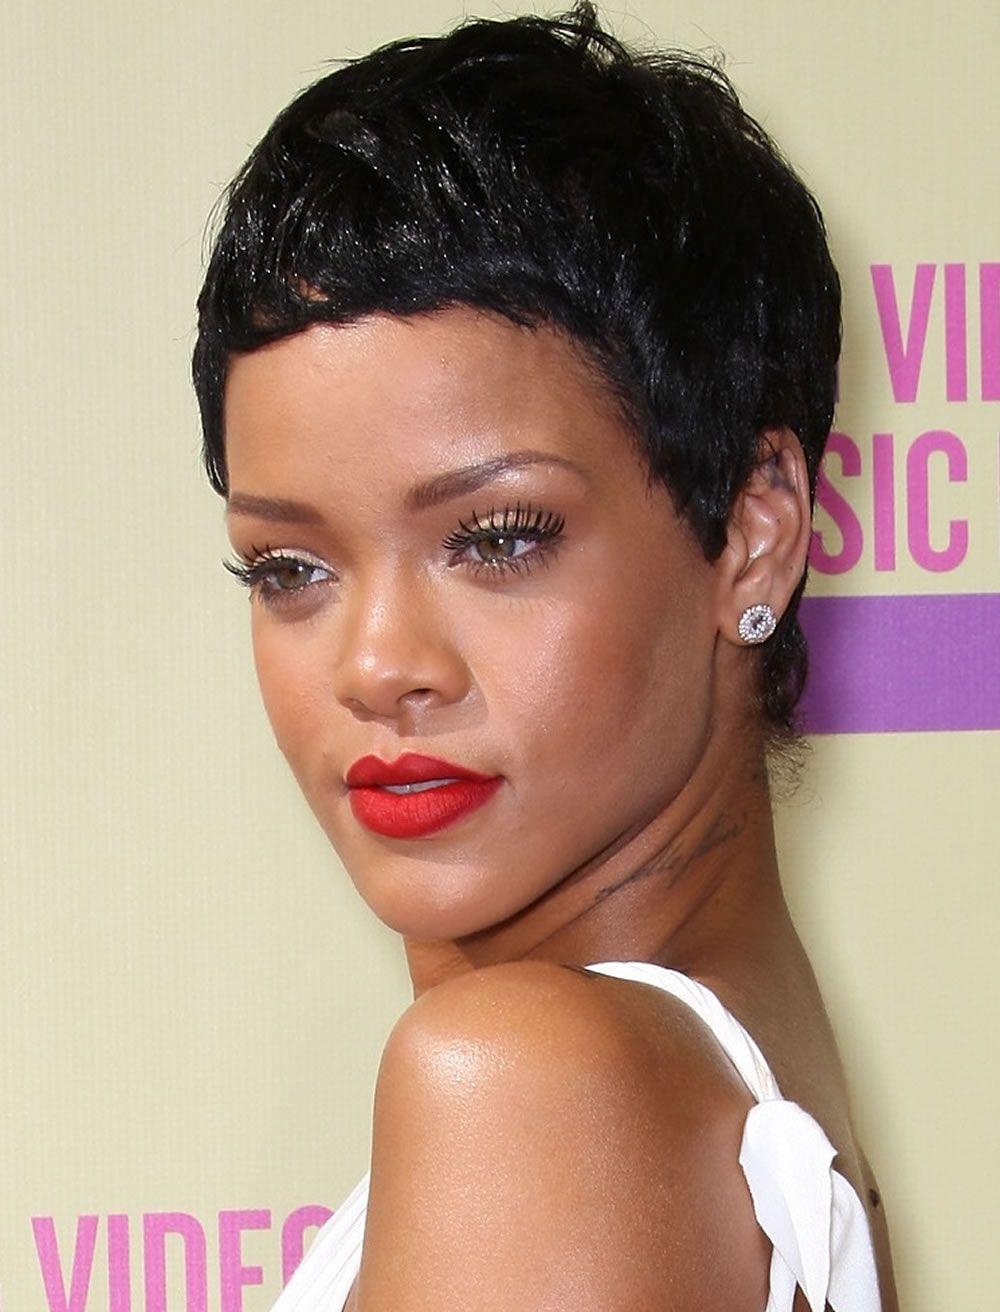 Coiffures courtes afro-américaine - Best Haircuts Cheveux noirs   Coiffure courte afro, Coiffure ...